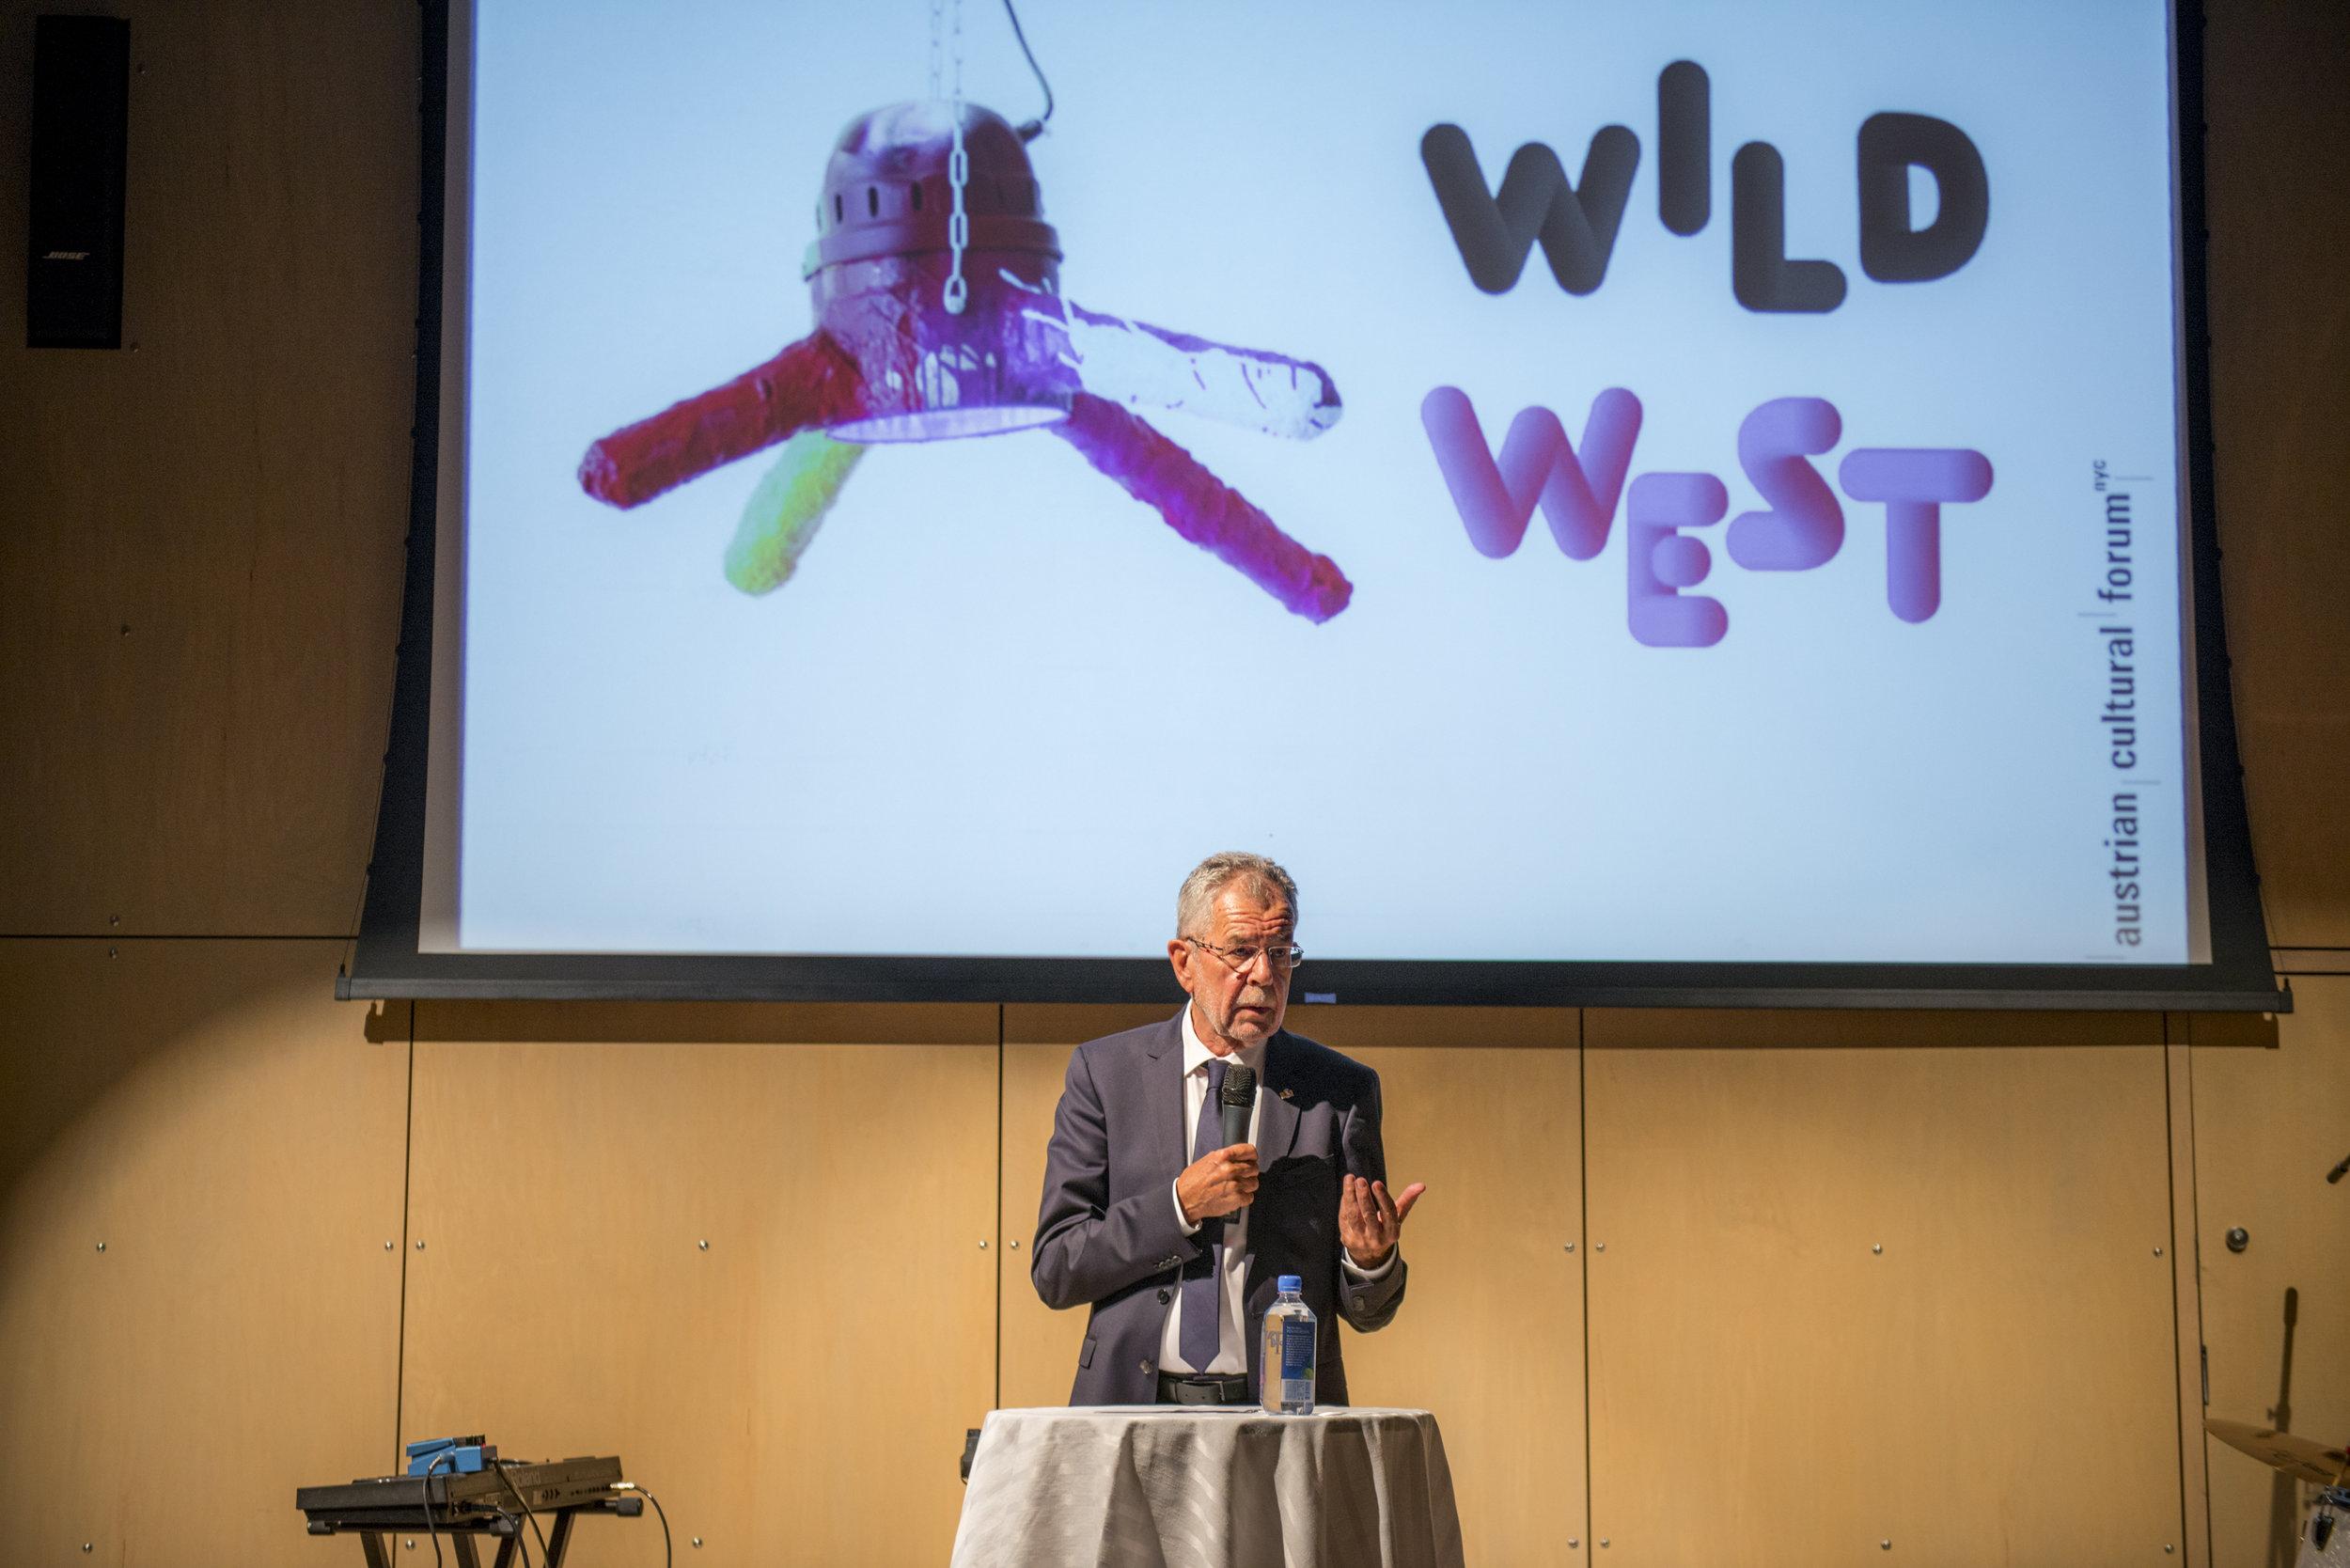 Remarks by President Alexander Van der Bellen at the WILD WEST  Opening Reception, September 19, 2017, at the Austrian Cultural Forum New York, Photo: David Plakke/ACFNY